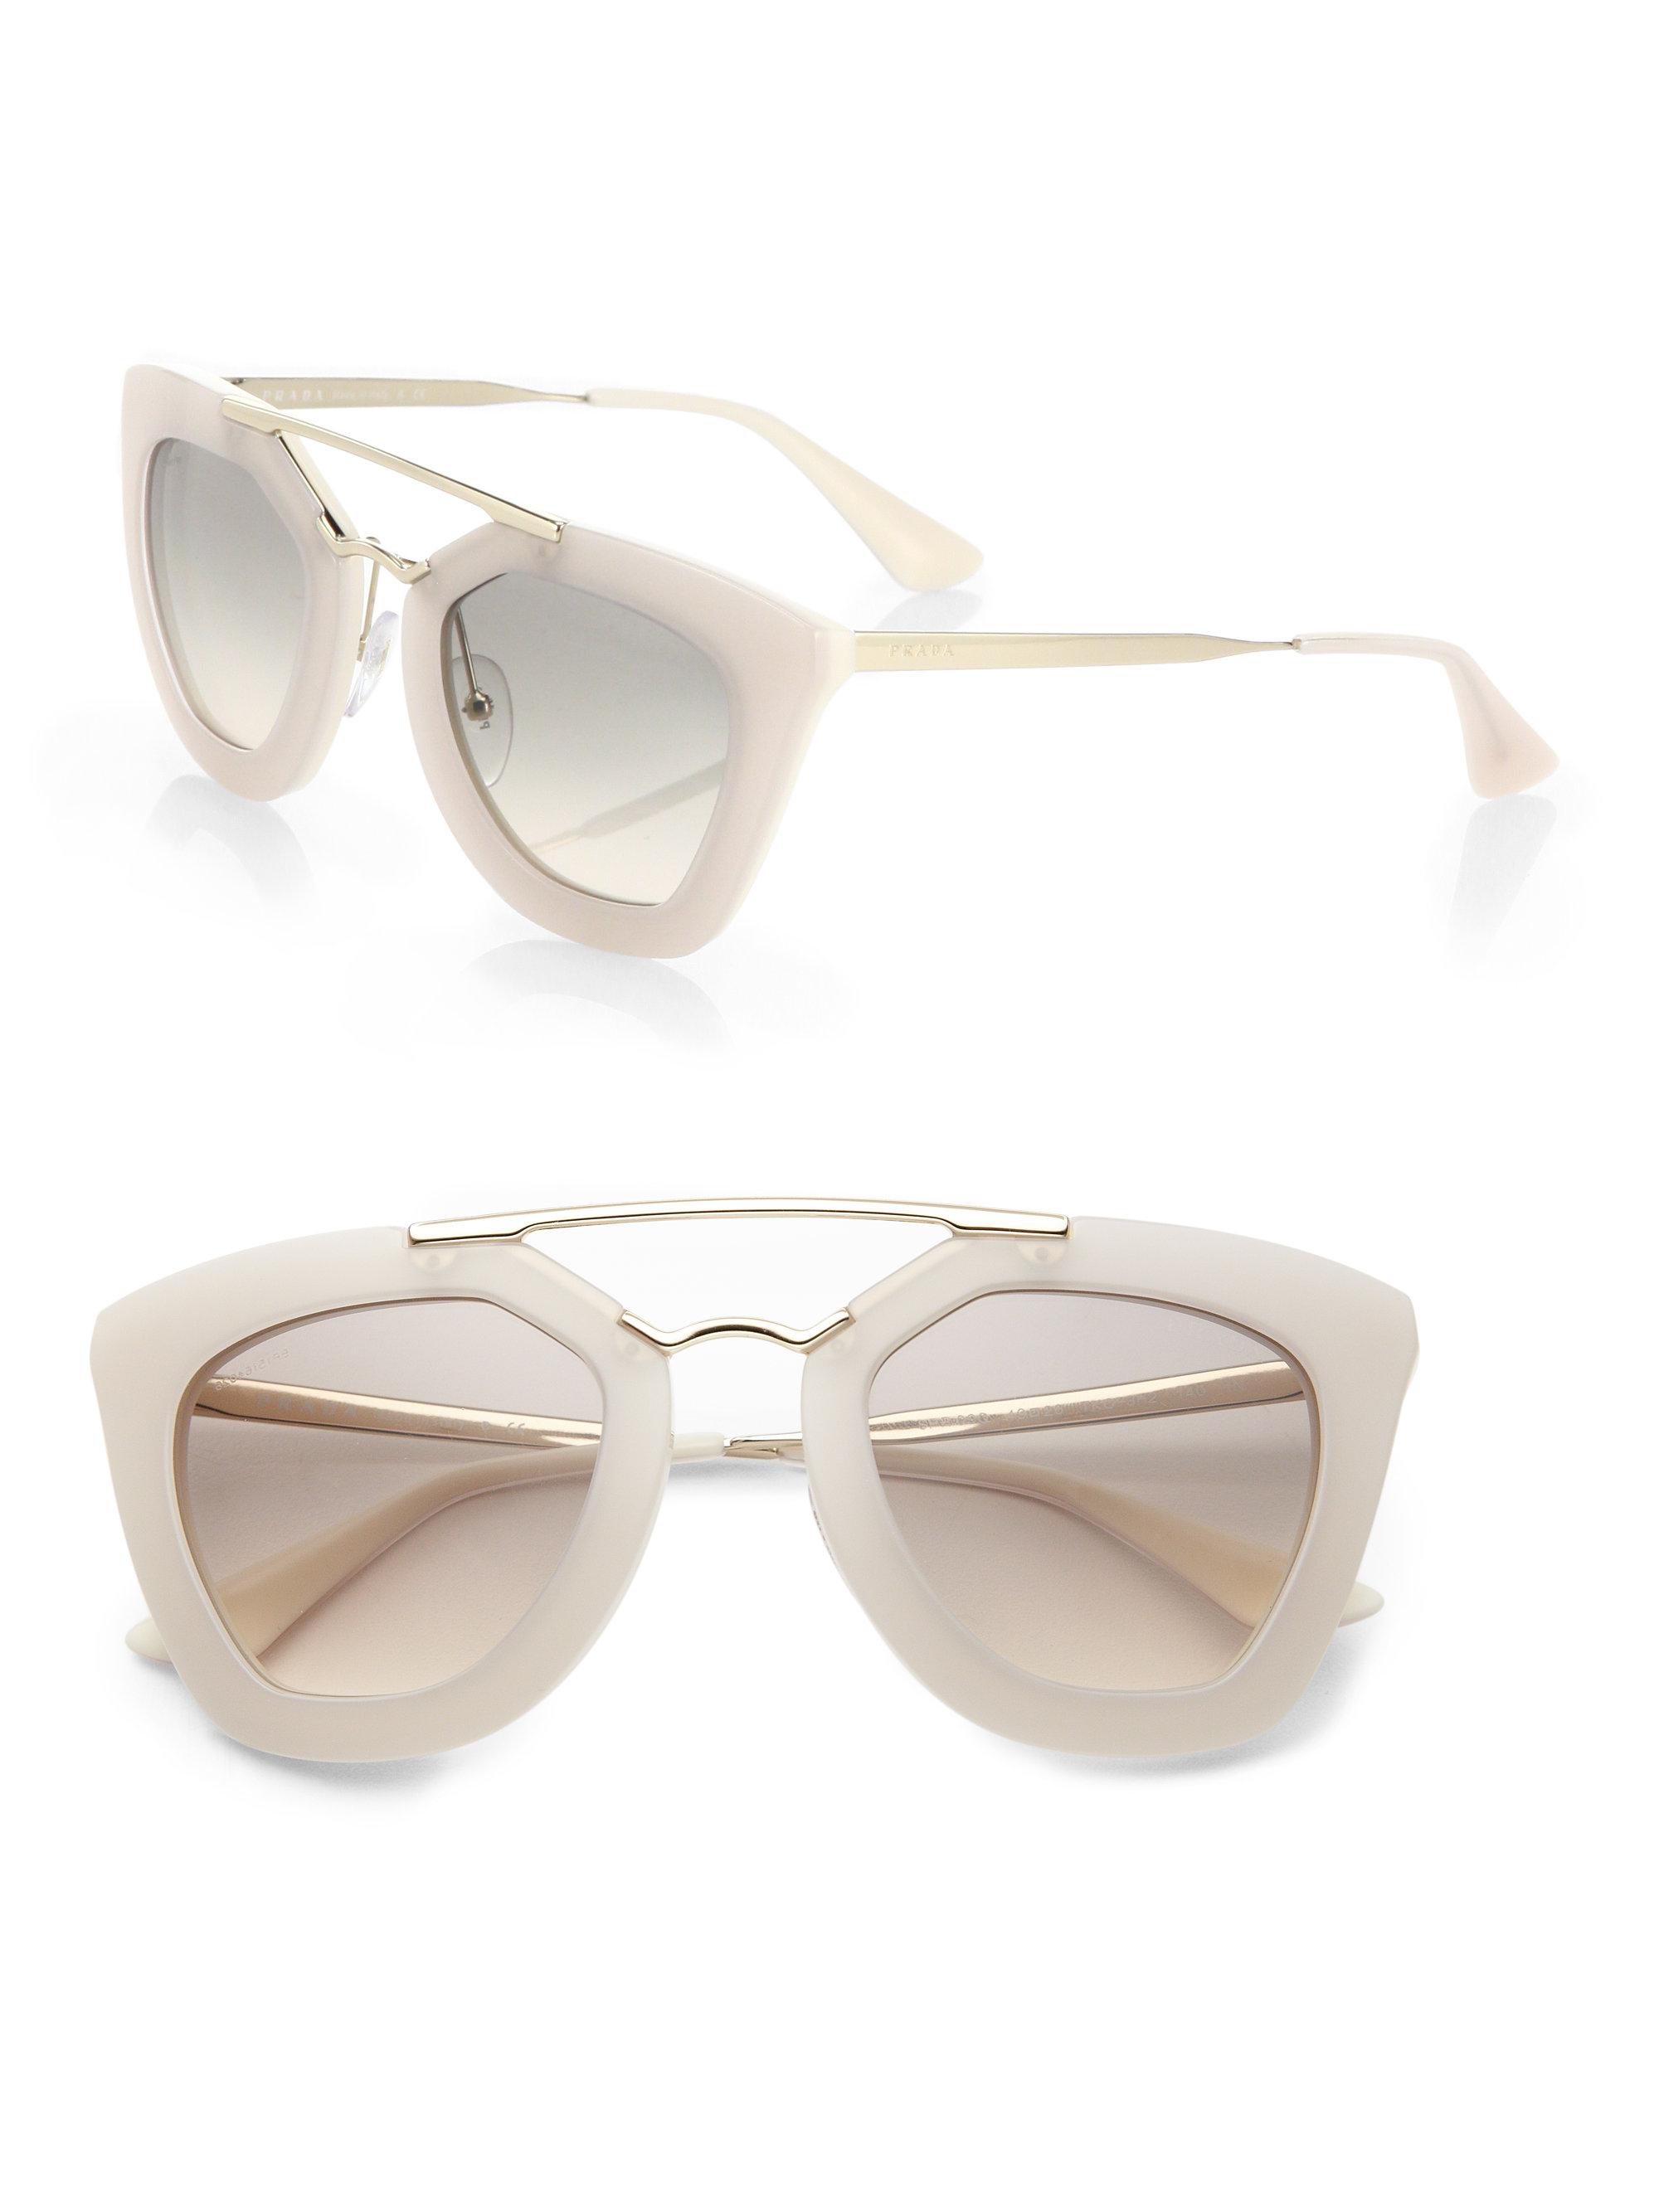 White Prada Sunglasses  prada 49mm angular frame sunglasses in white lyst